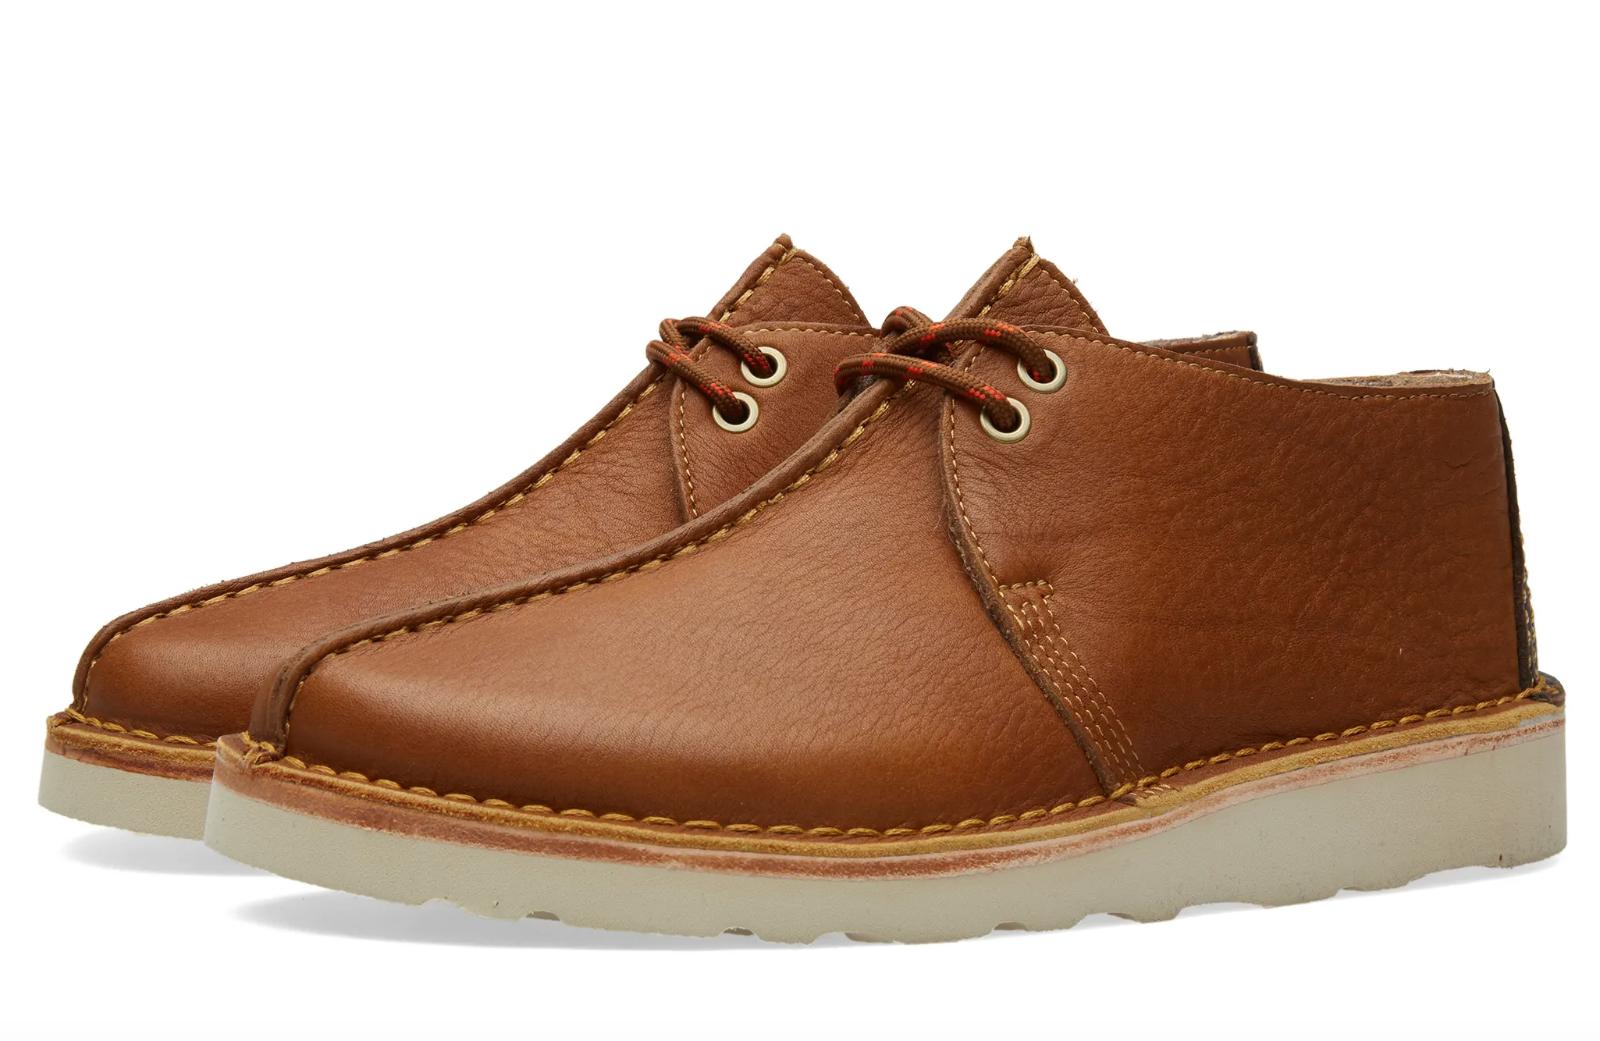 Clarks Originals Kilve Trek Mens UK 12 G Tan Leather Vibrim Desert Chukka Boots